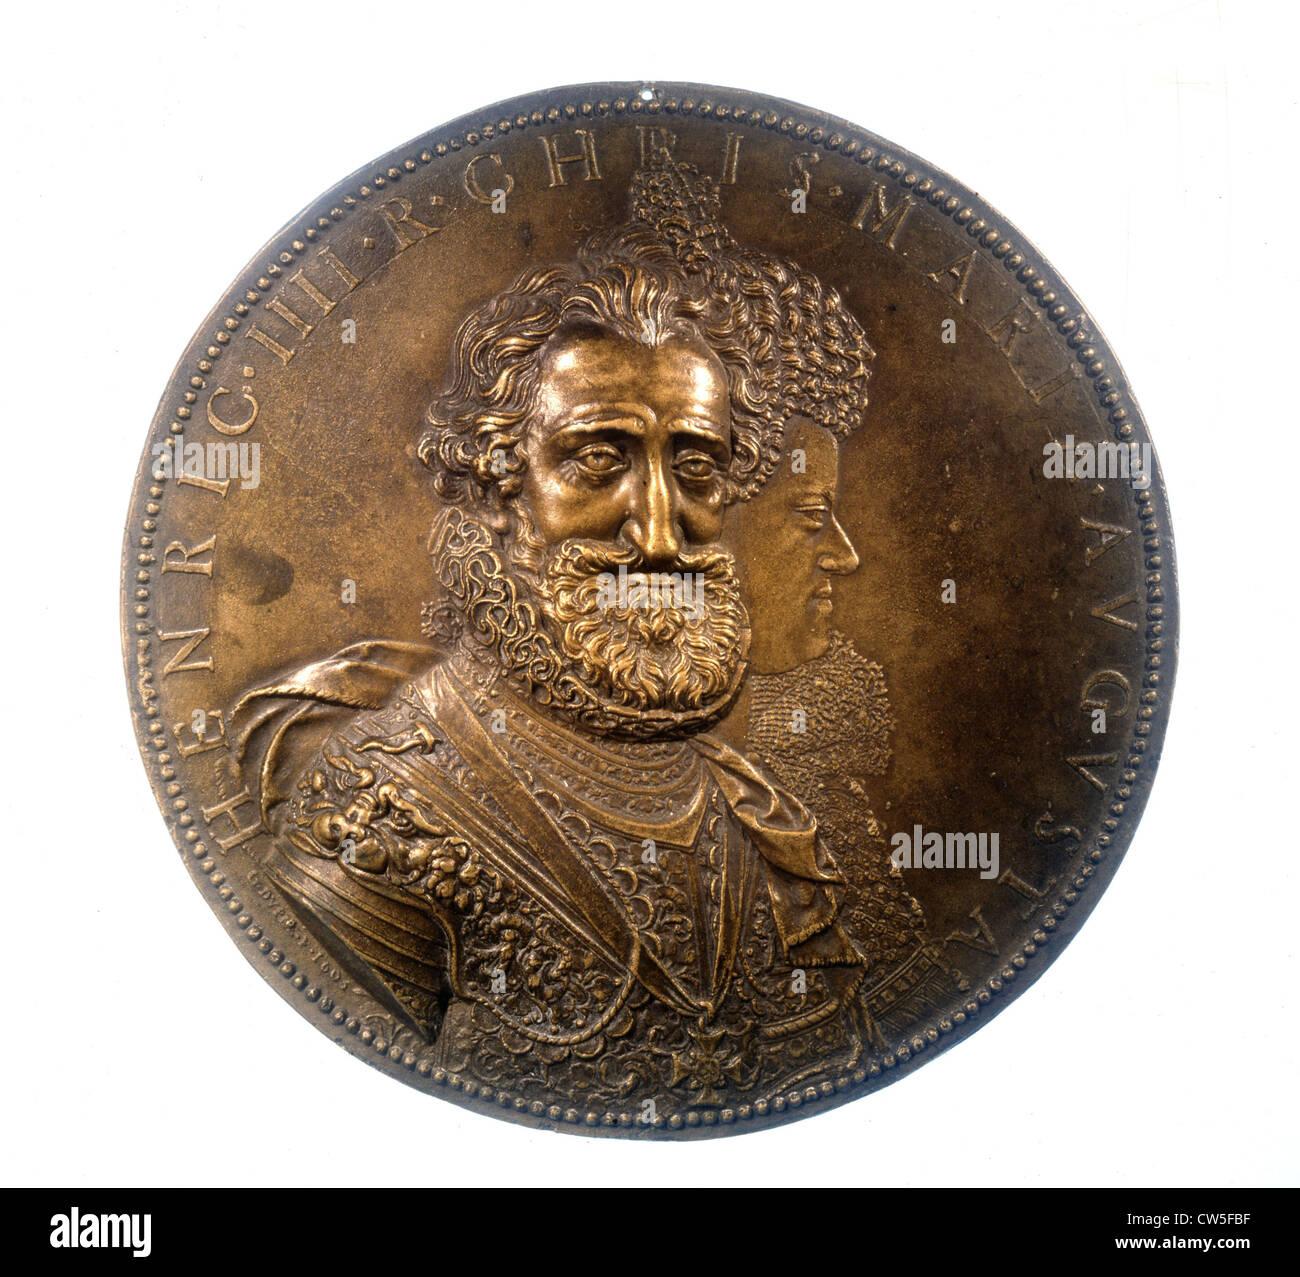 Bronze medal by G. Dupré, Henri IV (1553-1610) and Marie de Médicis (1573-1642) - Stock Image